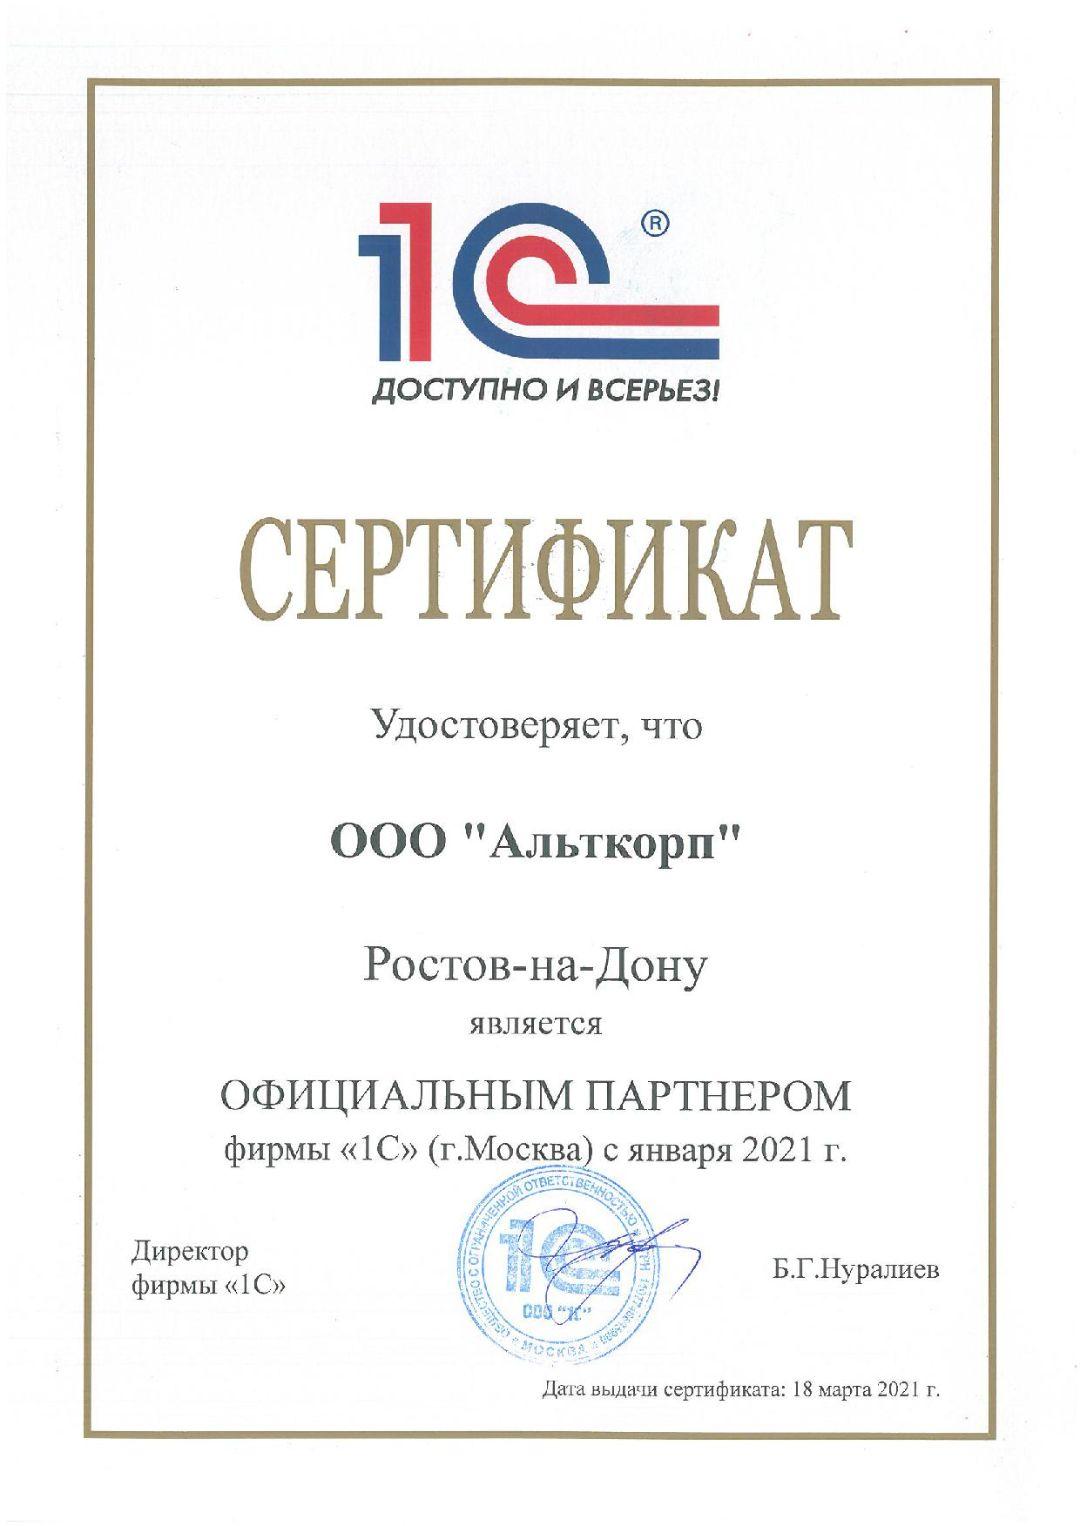 1С Сертификат